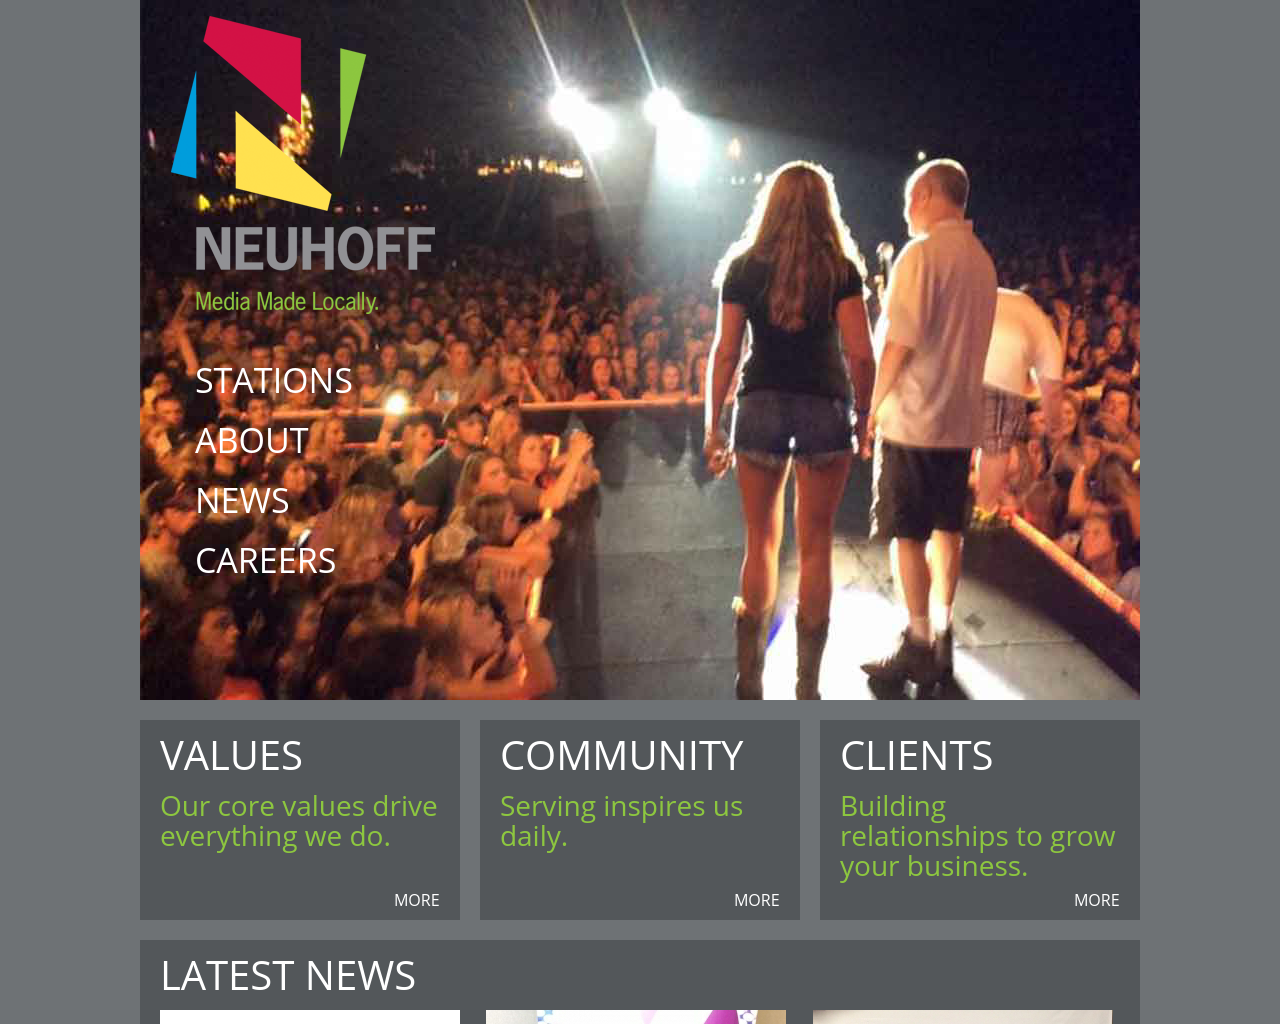 Neuhoff-Communications-Advertising-Reviews-Pricing